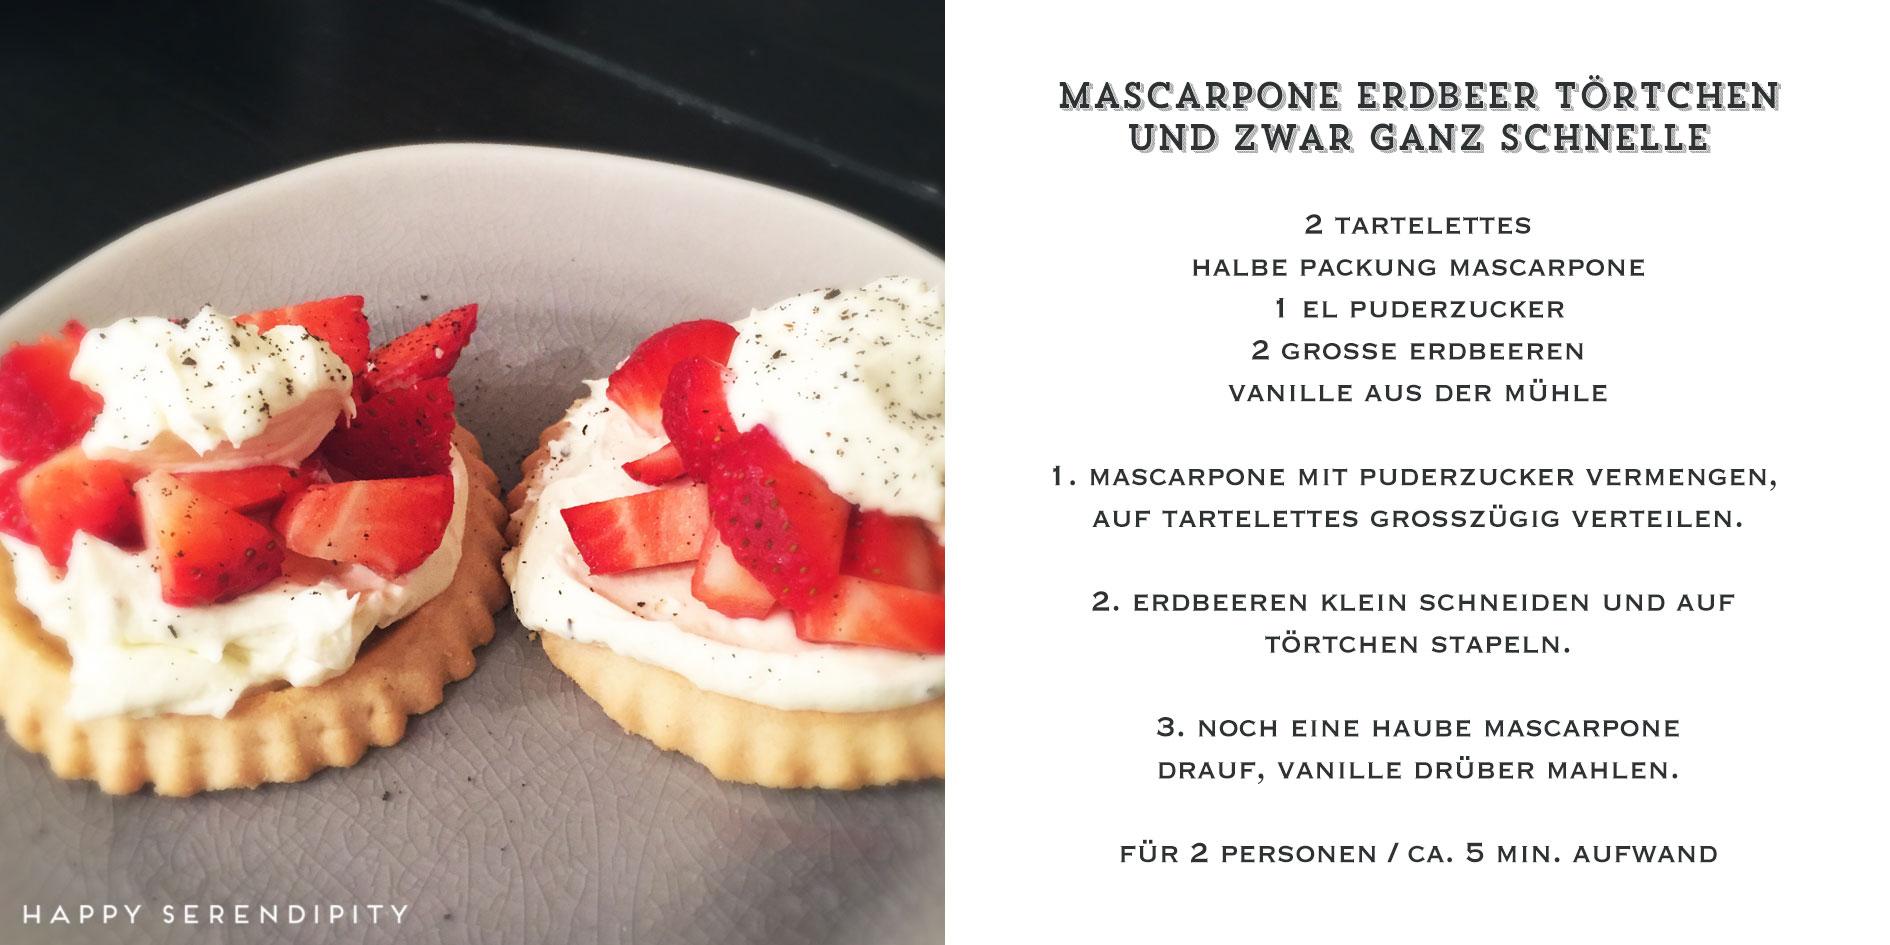 happy serendipity kocht veggie, rezept mascarpone erdbeer törtchen